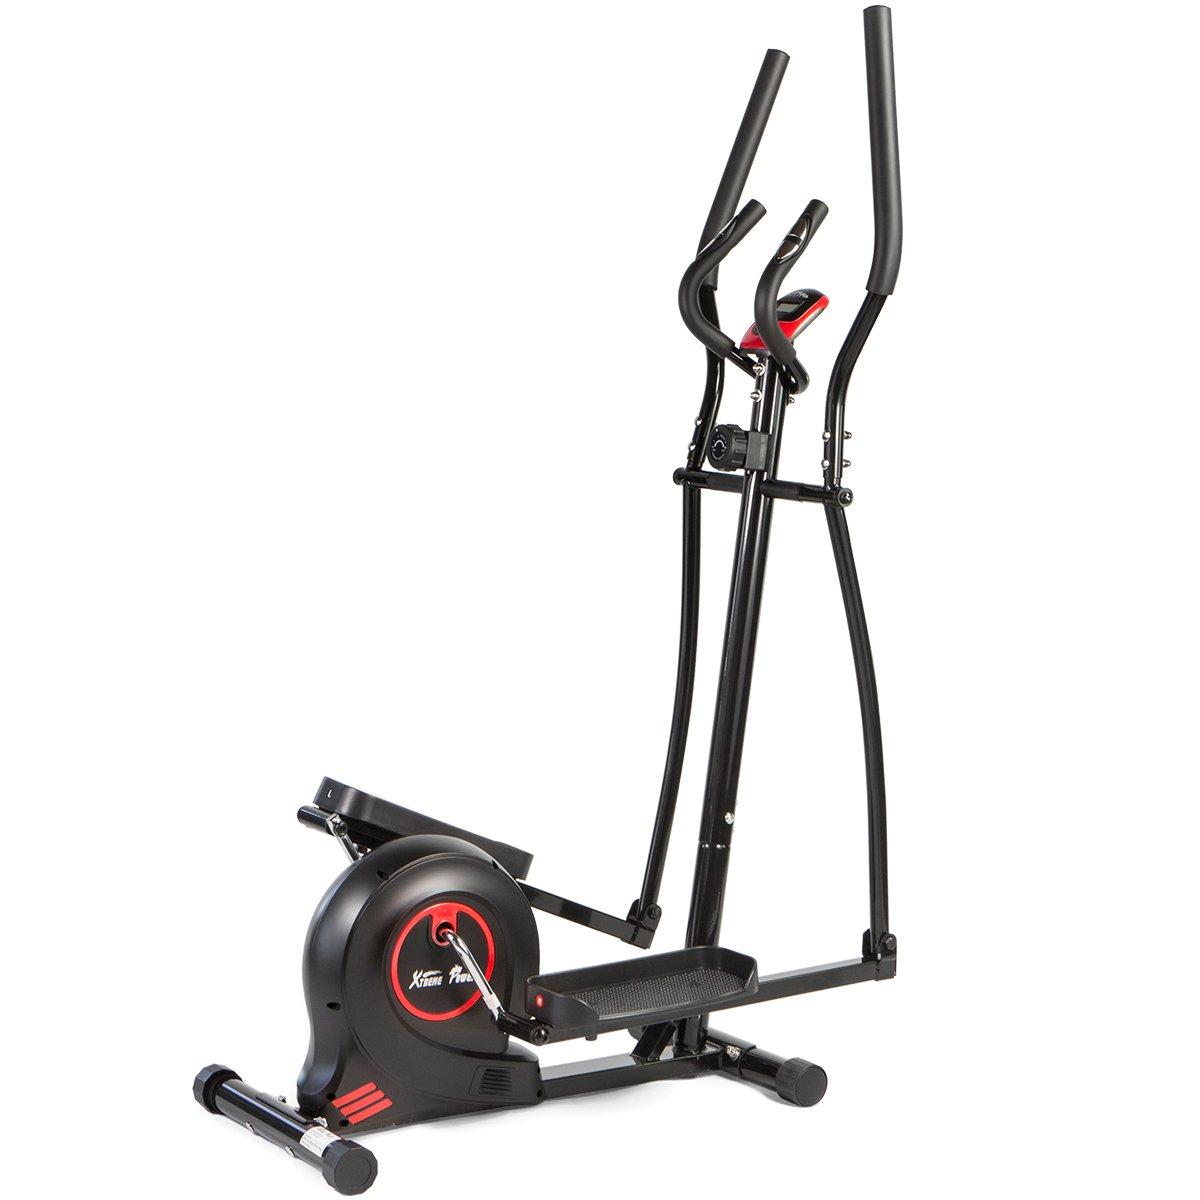 XtremepowerUS Magnetic Elliptical Fitness Training Machine Cardio Workout Trainer